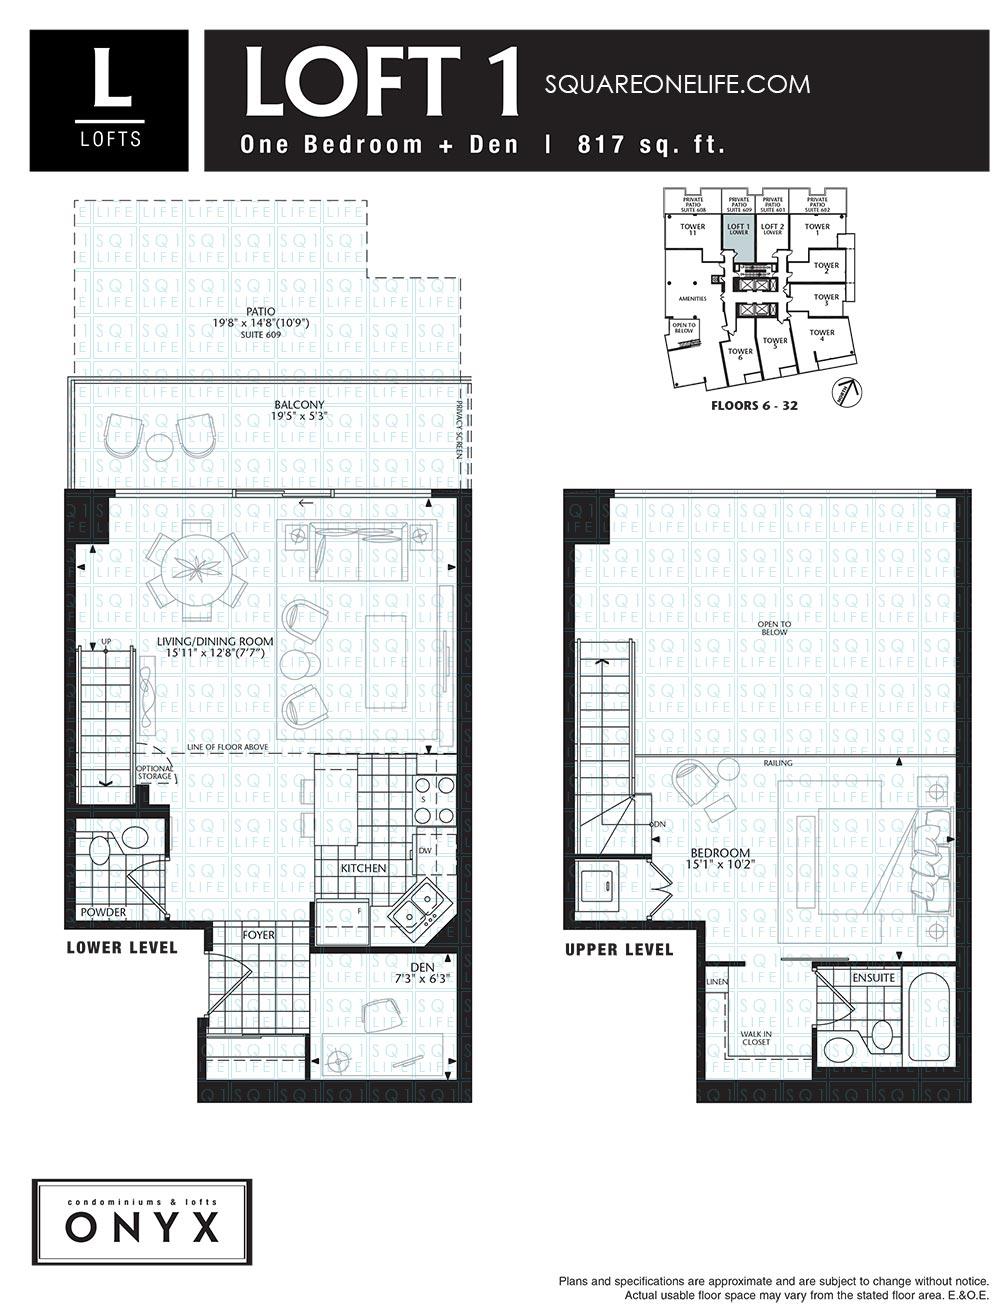 223-Webb-Dr-Onyx-Condo-Floorplan-Loft-1-1-Bed-1-Den onyx condo Onyx Condo 223 Webb Dr Onyx Condo Floorplan Loft 1 1 Bed 1 Den